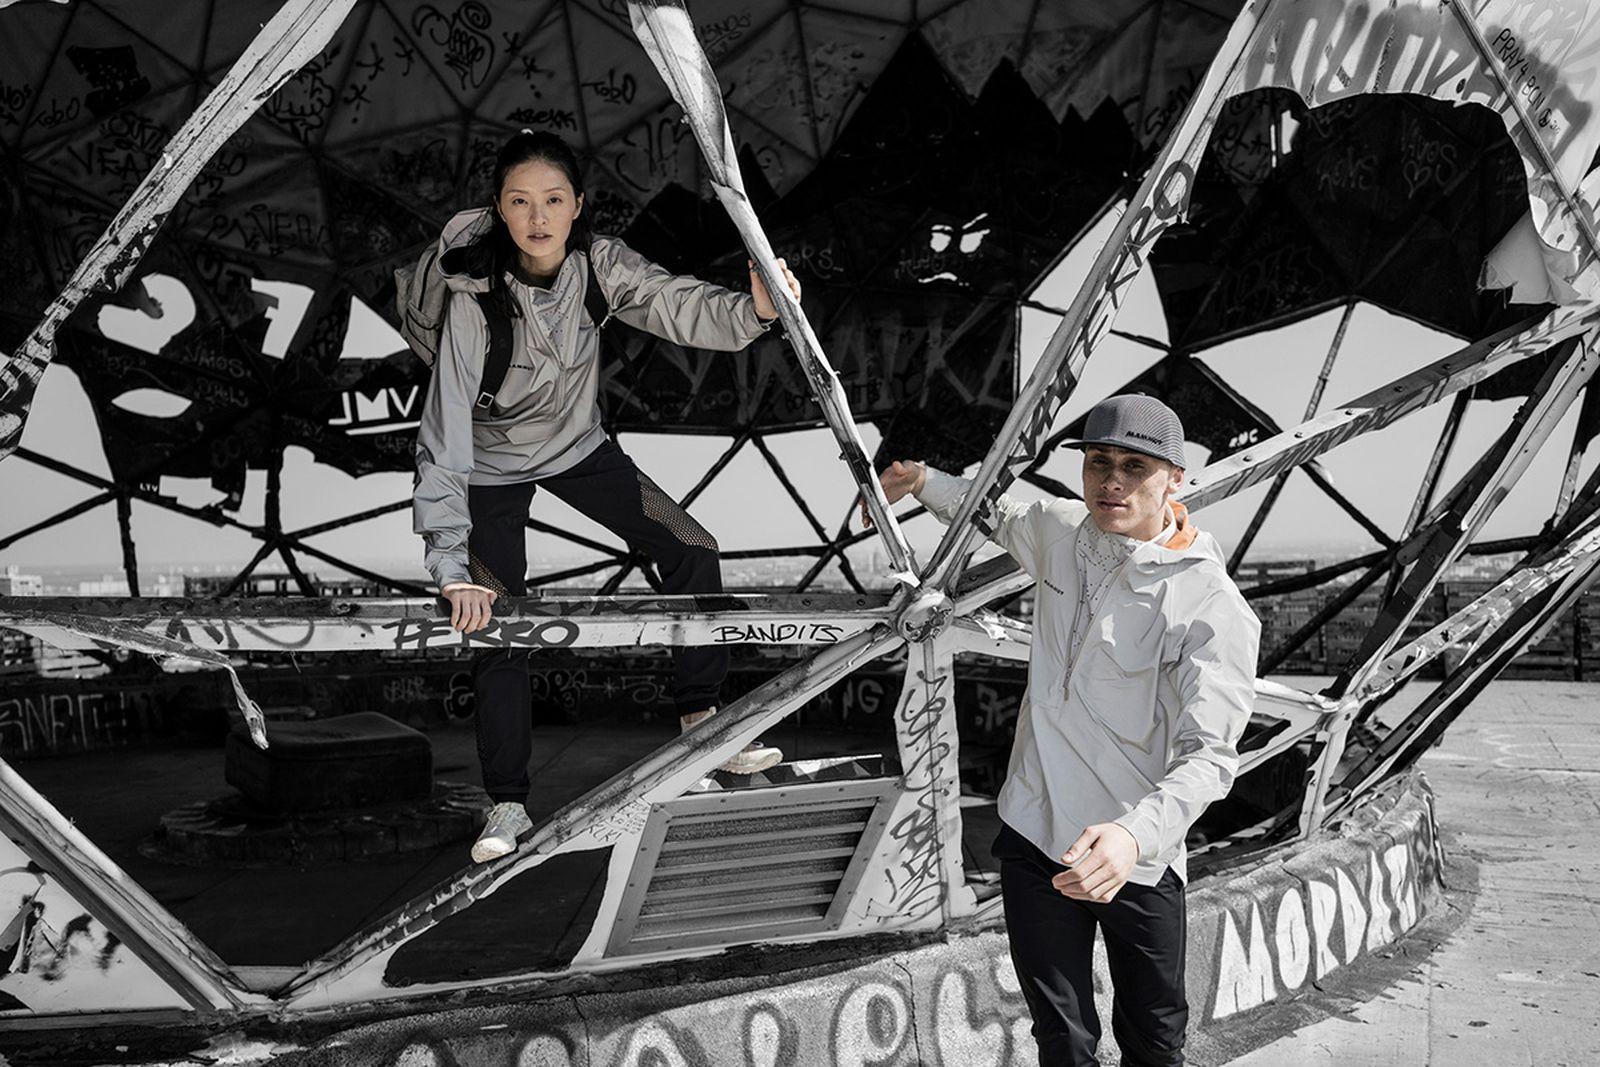 delta x mammut interview Activewear sportswear